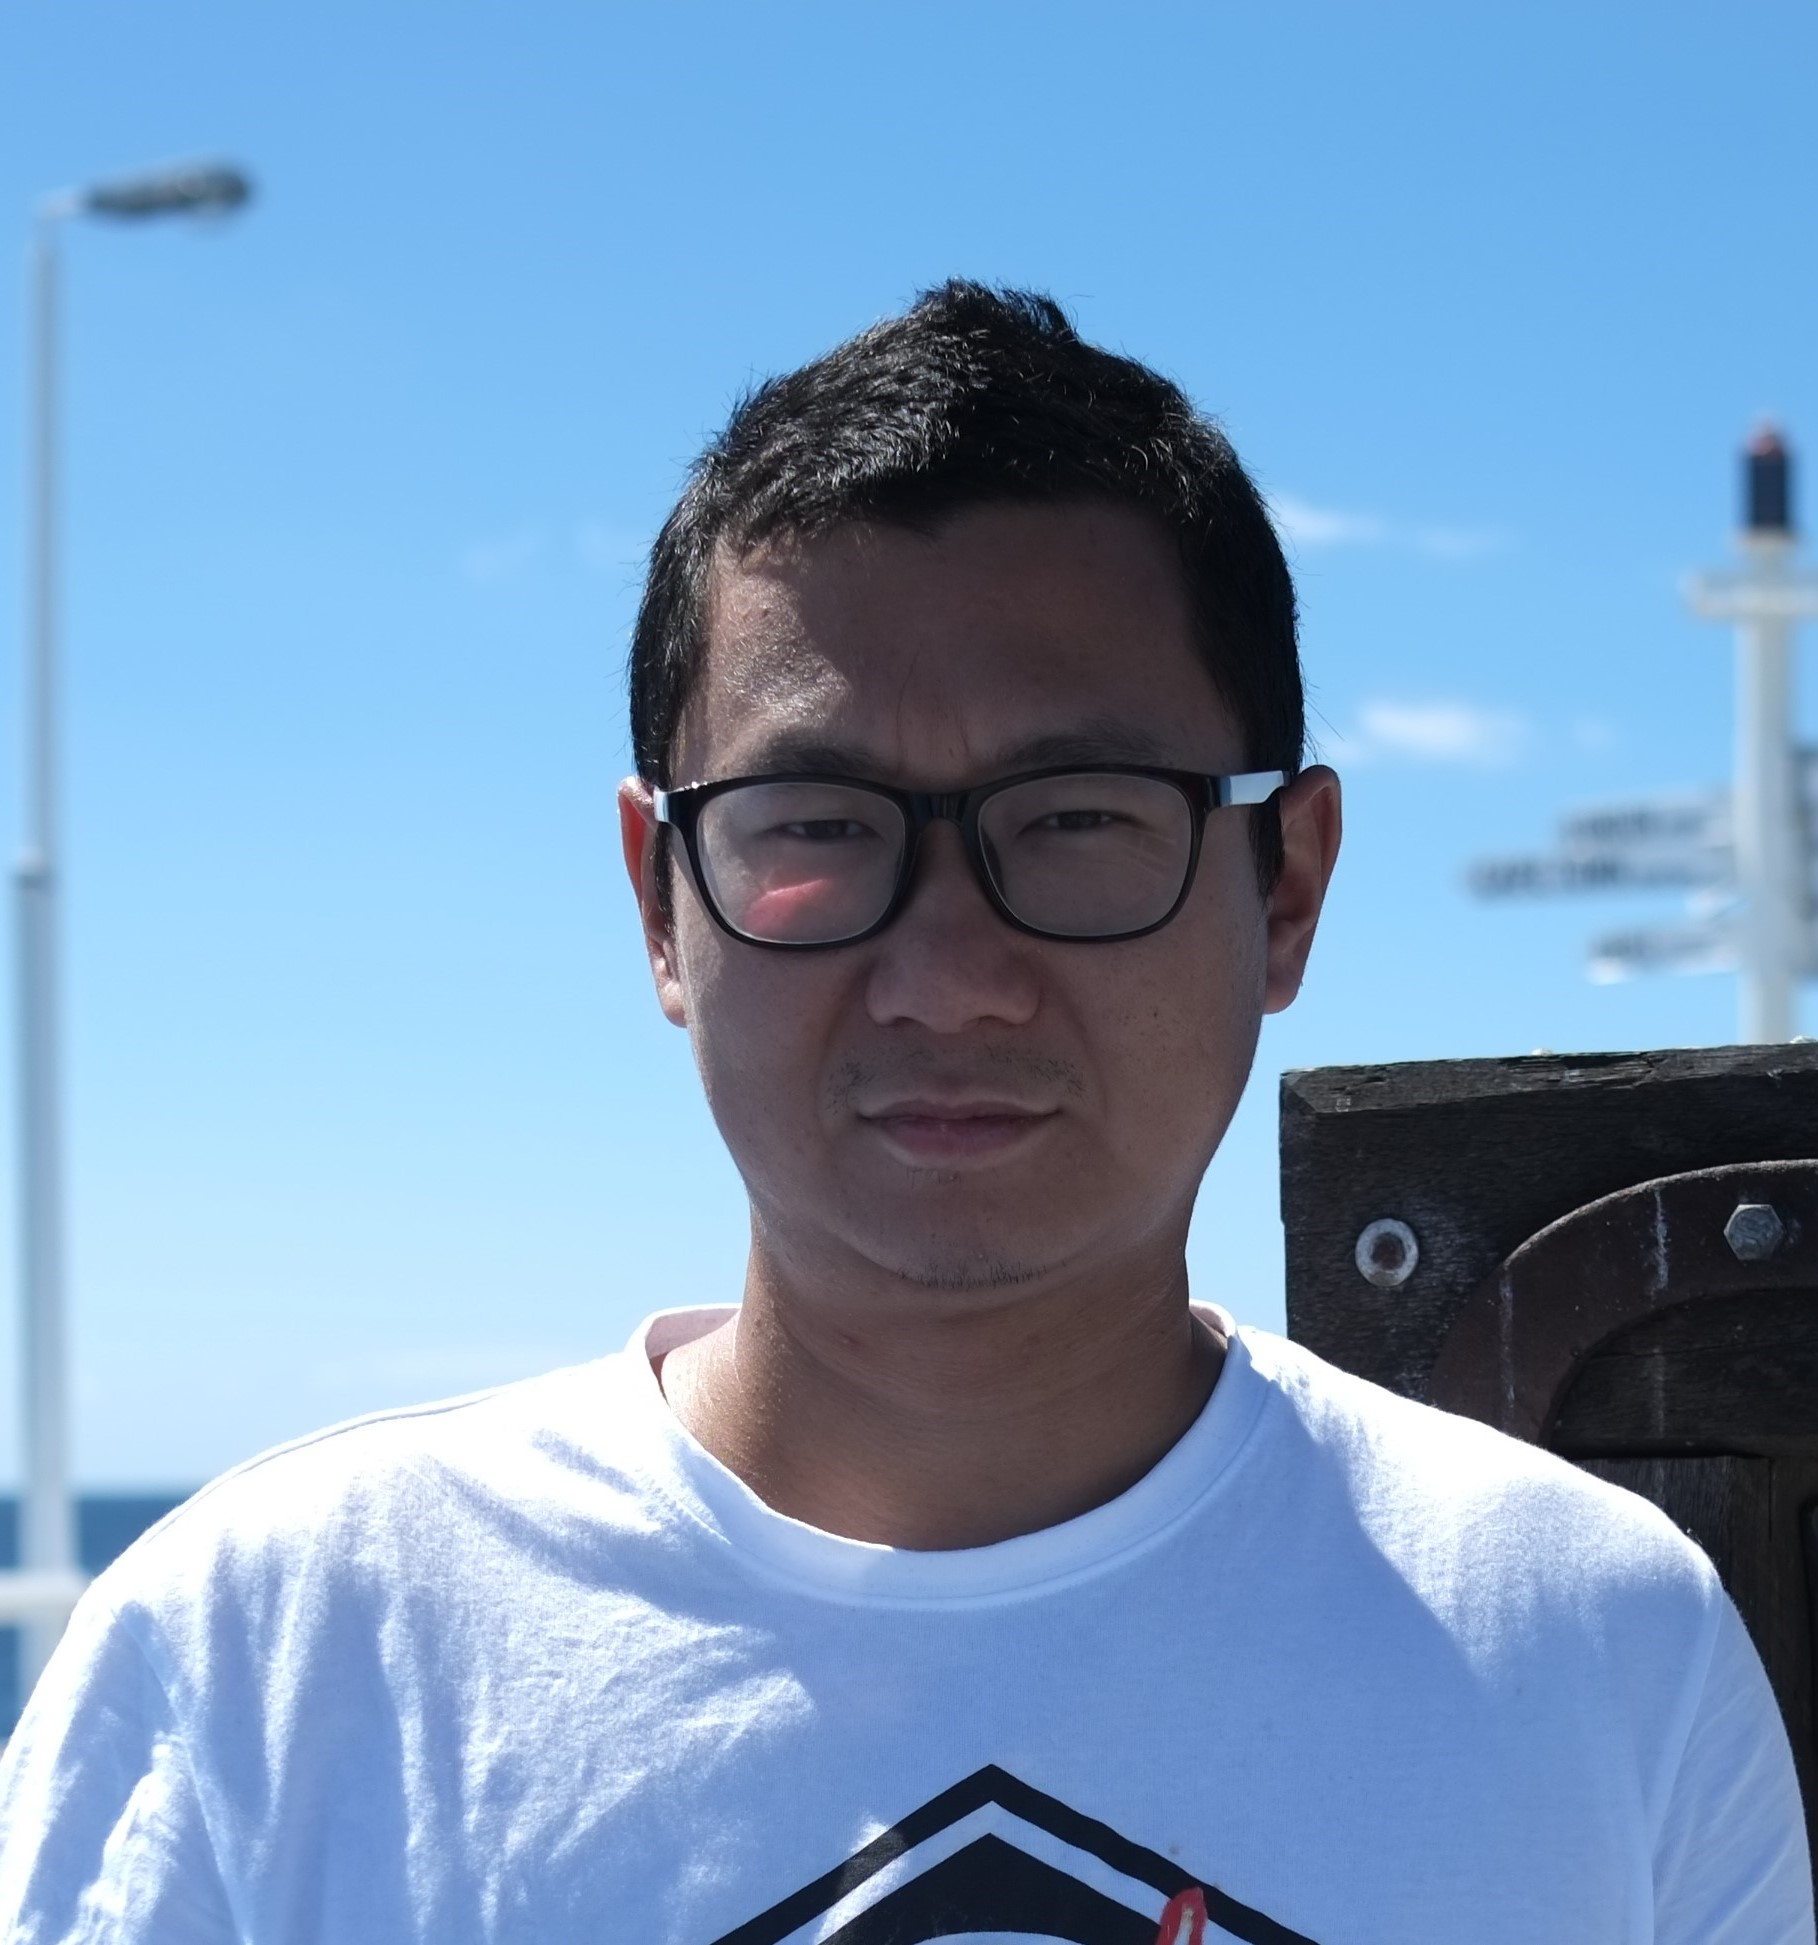 http://gis.curtin.edu.au/wp-content/uploads/sites/20/2021/04/kexiang-hu-profile.jpg